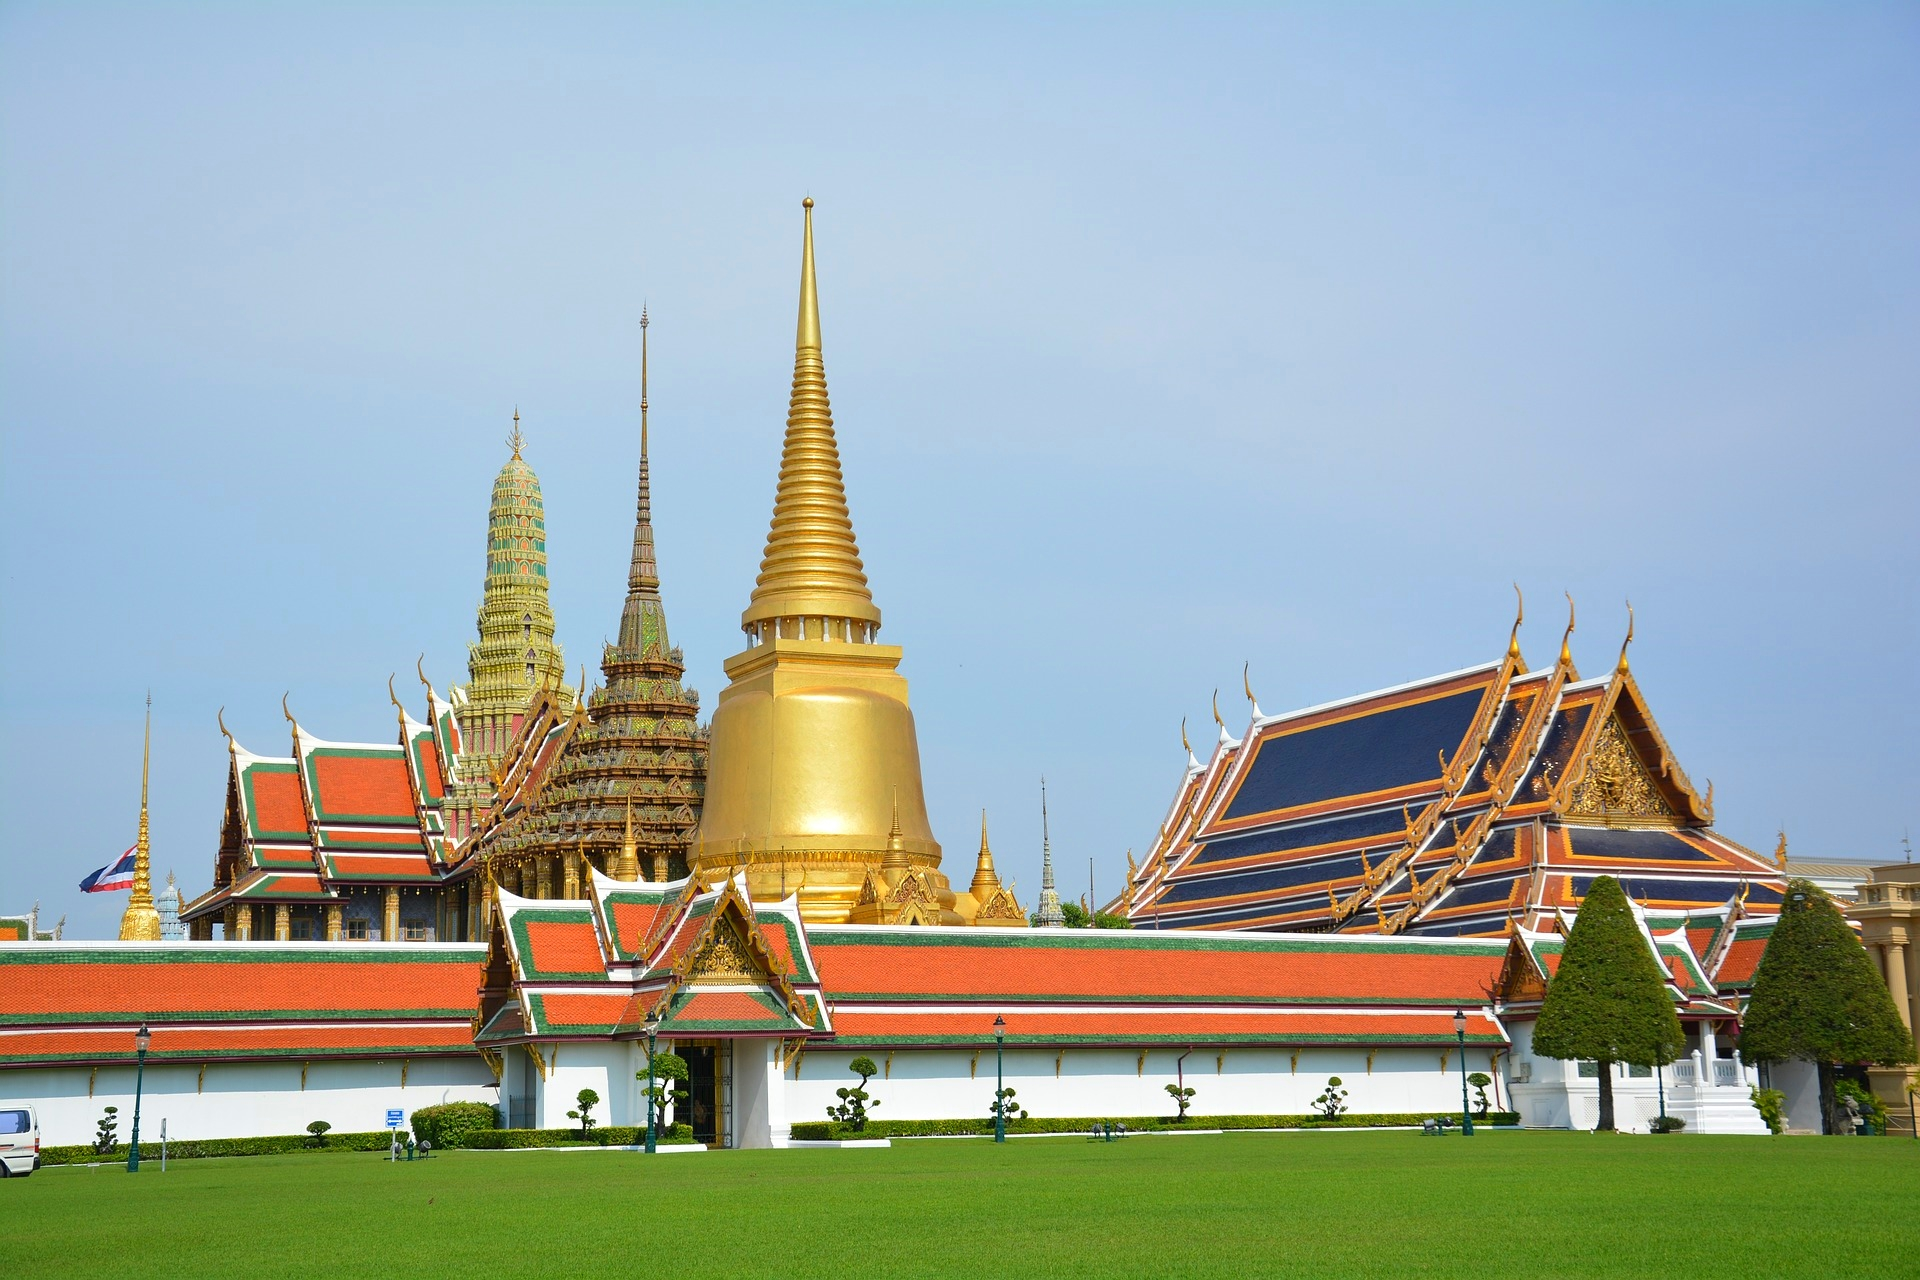 temple-of-the-emerald-buddha-507045_1920.jpg